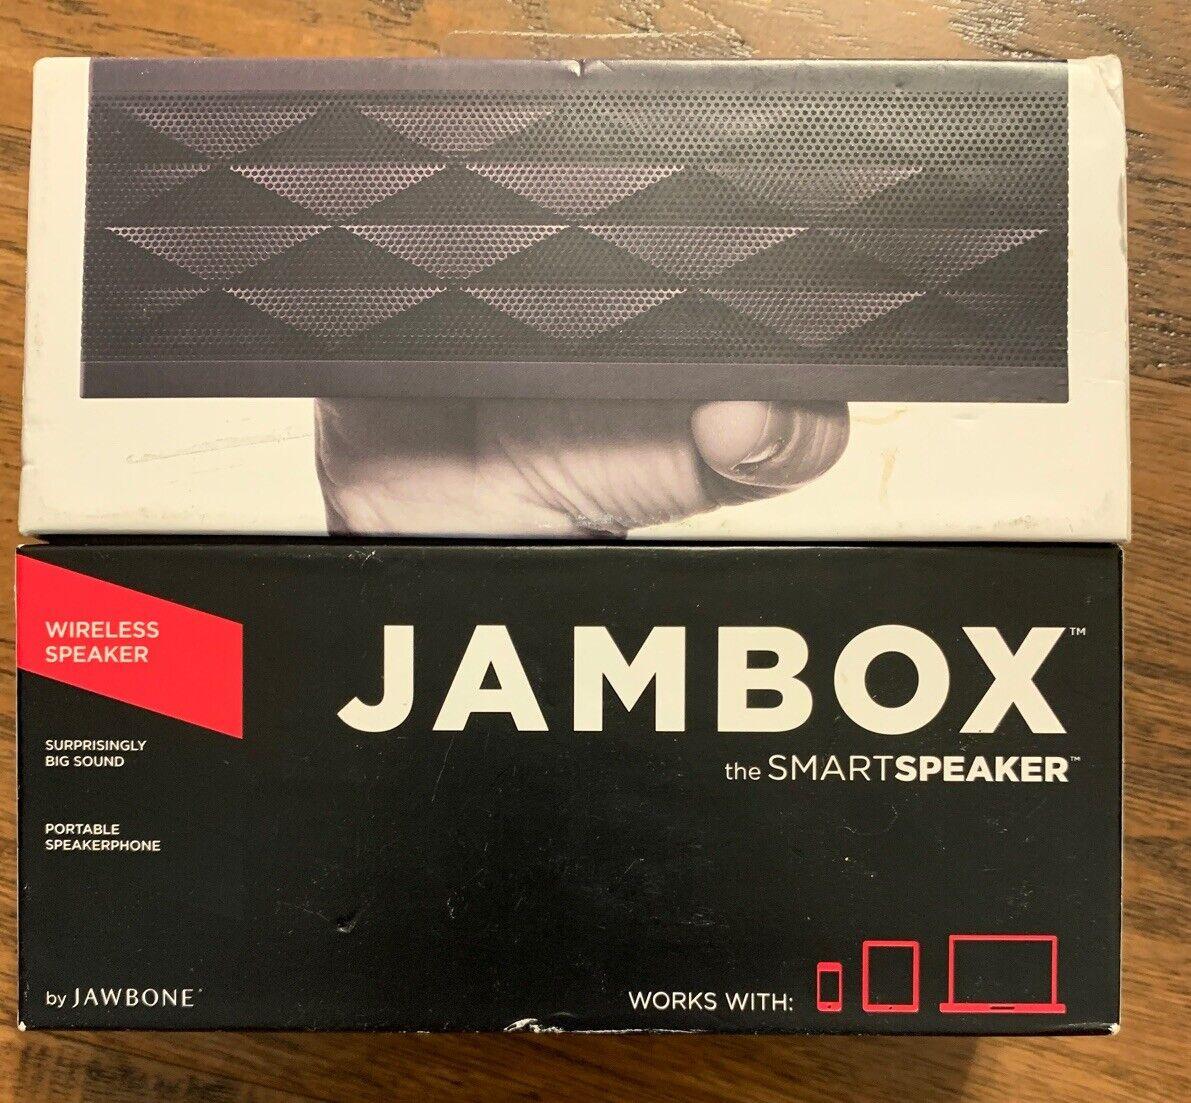 Jawbone Jambox Wireless Portable Speaker Black Diamond V3J-JBE